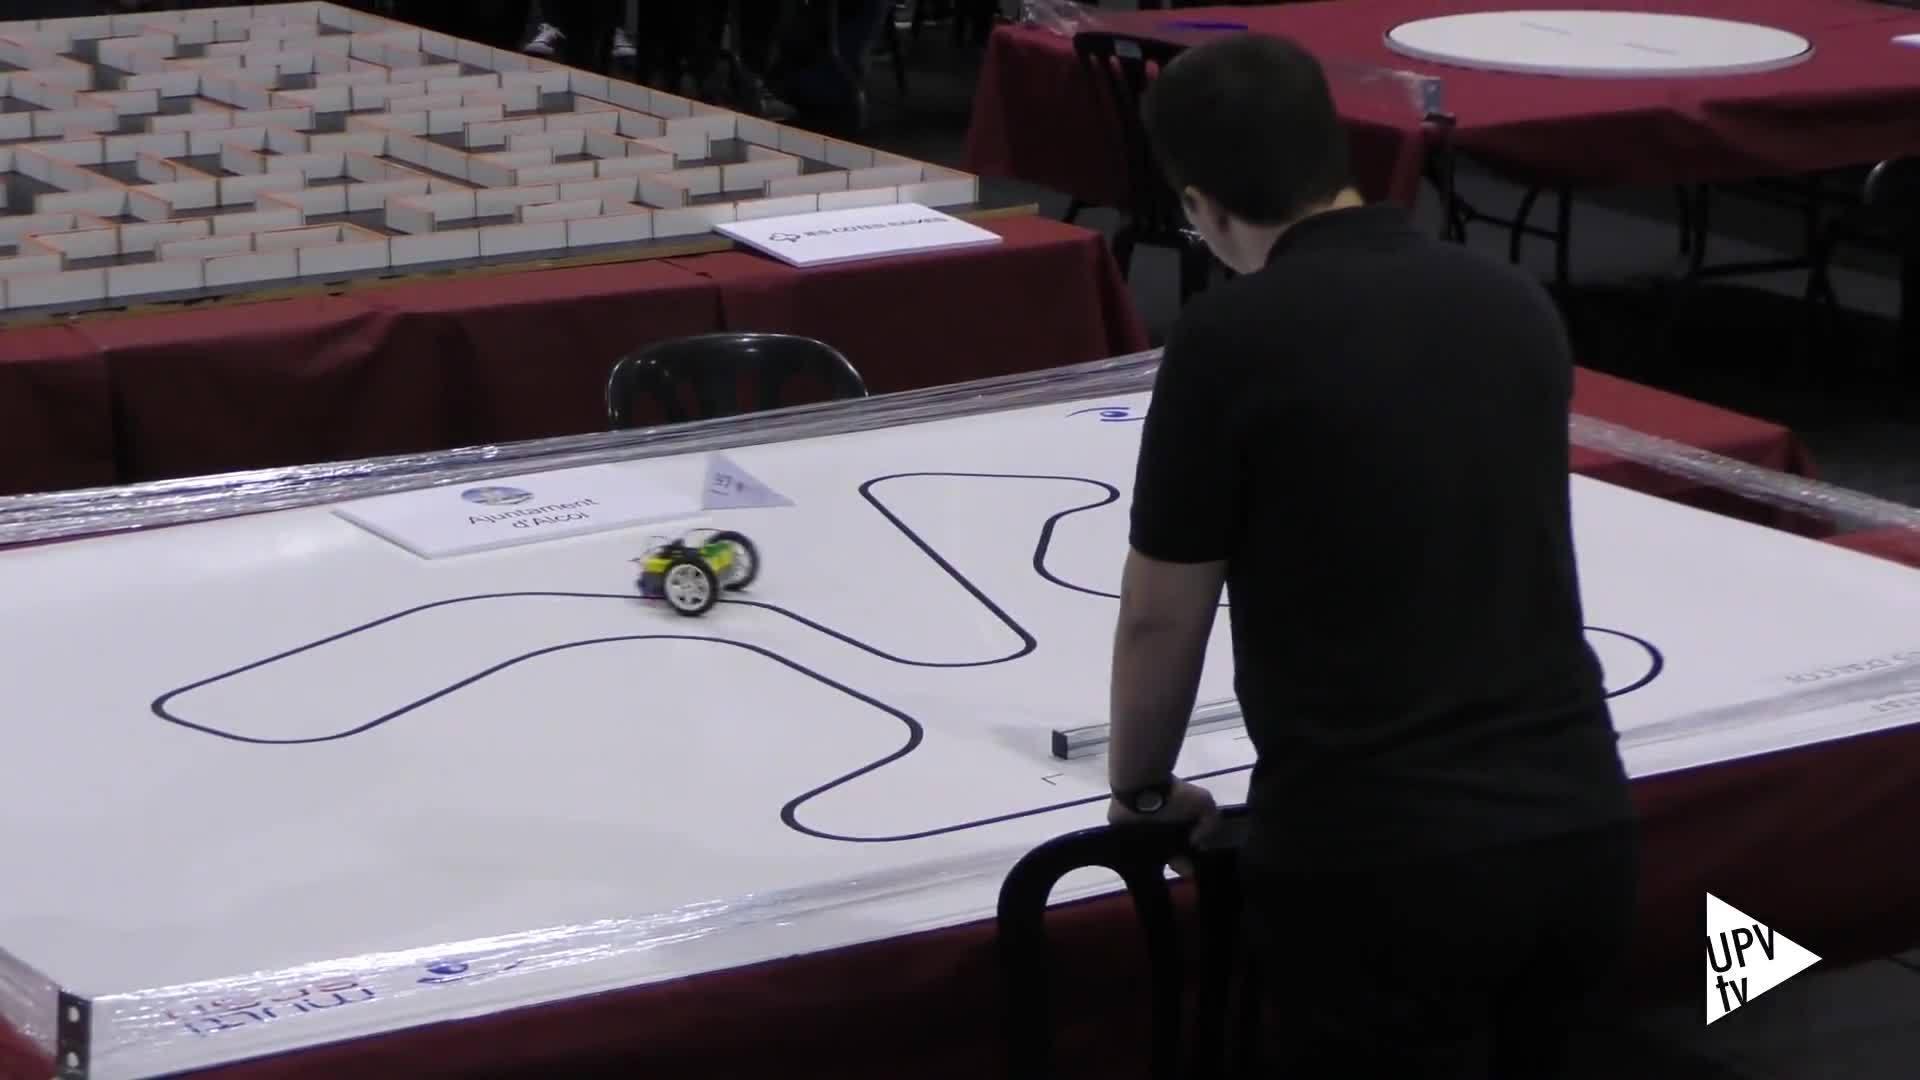 13-02-2019 Desafío de robótica